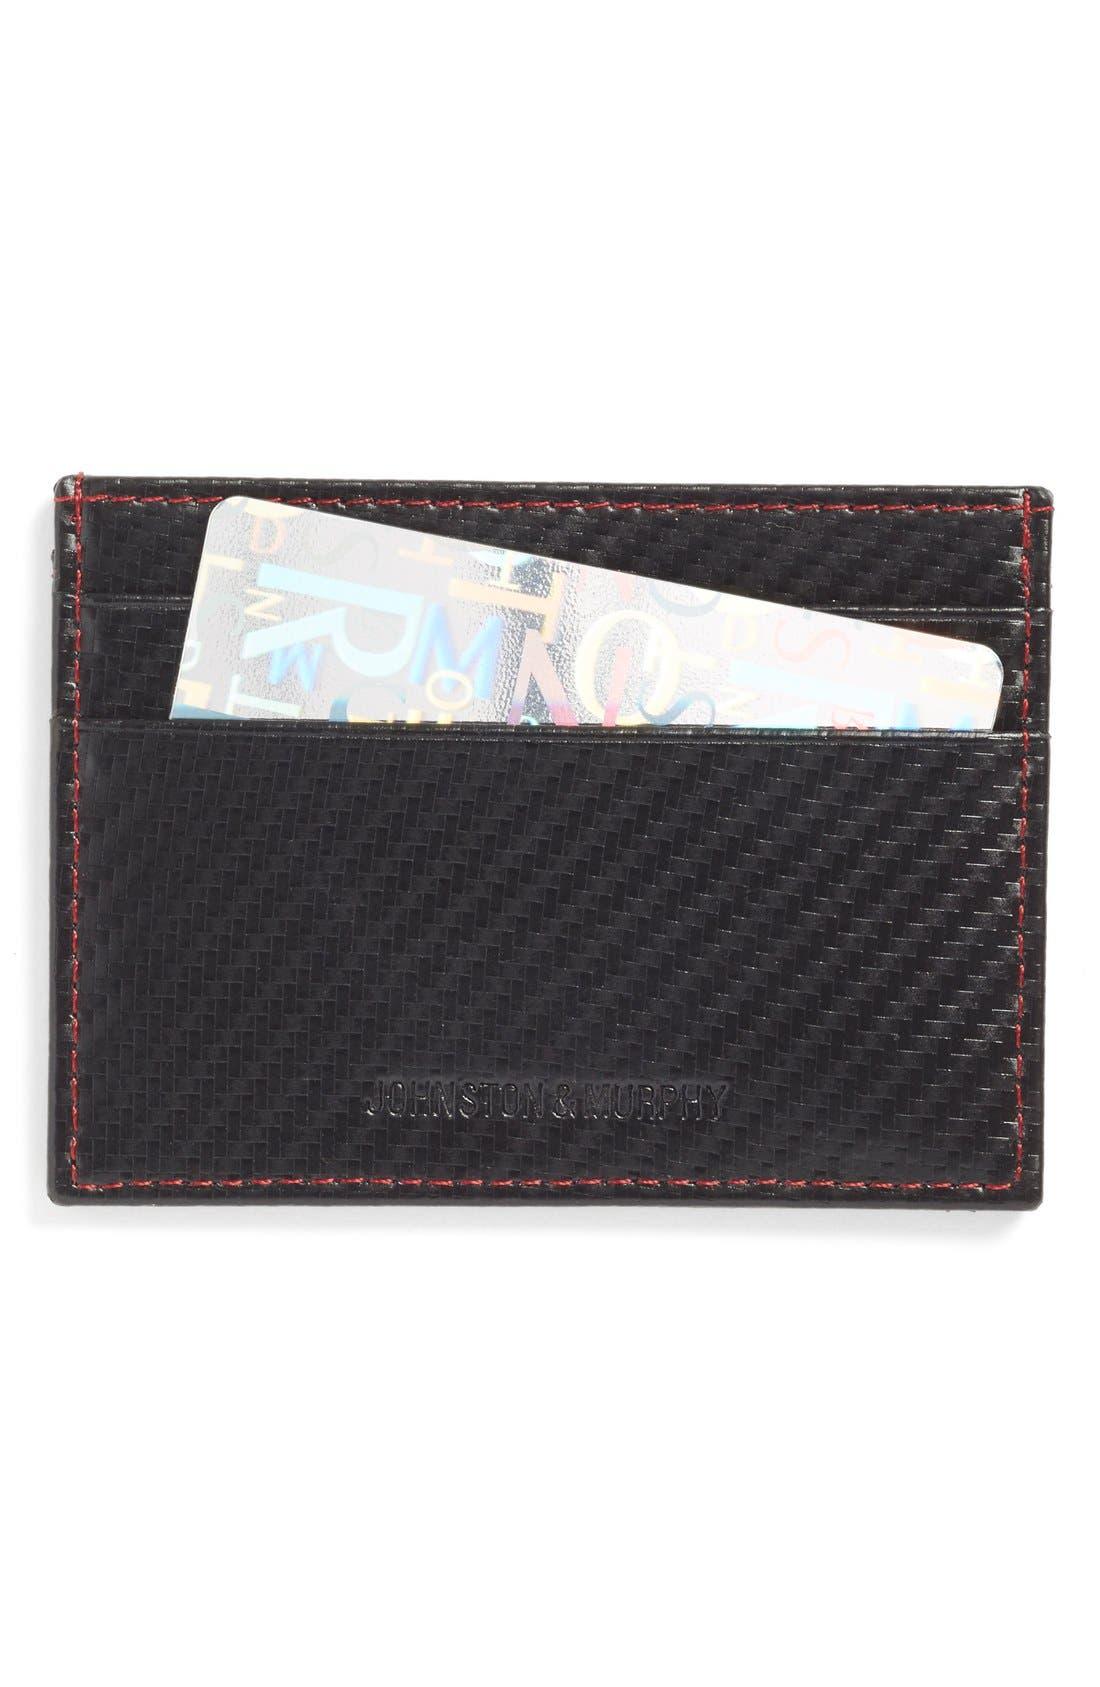 Main Image - Johnston & Murphy Card Case